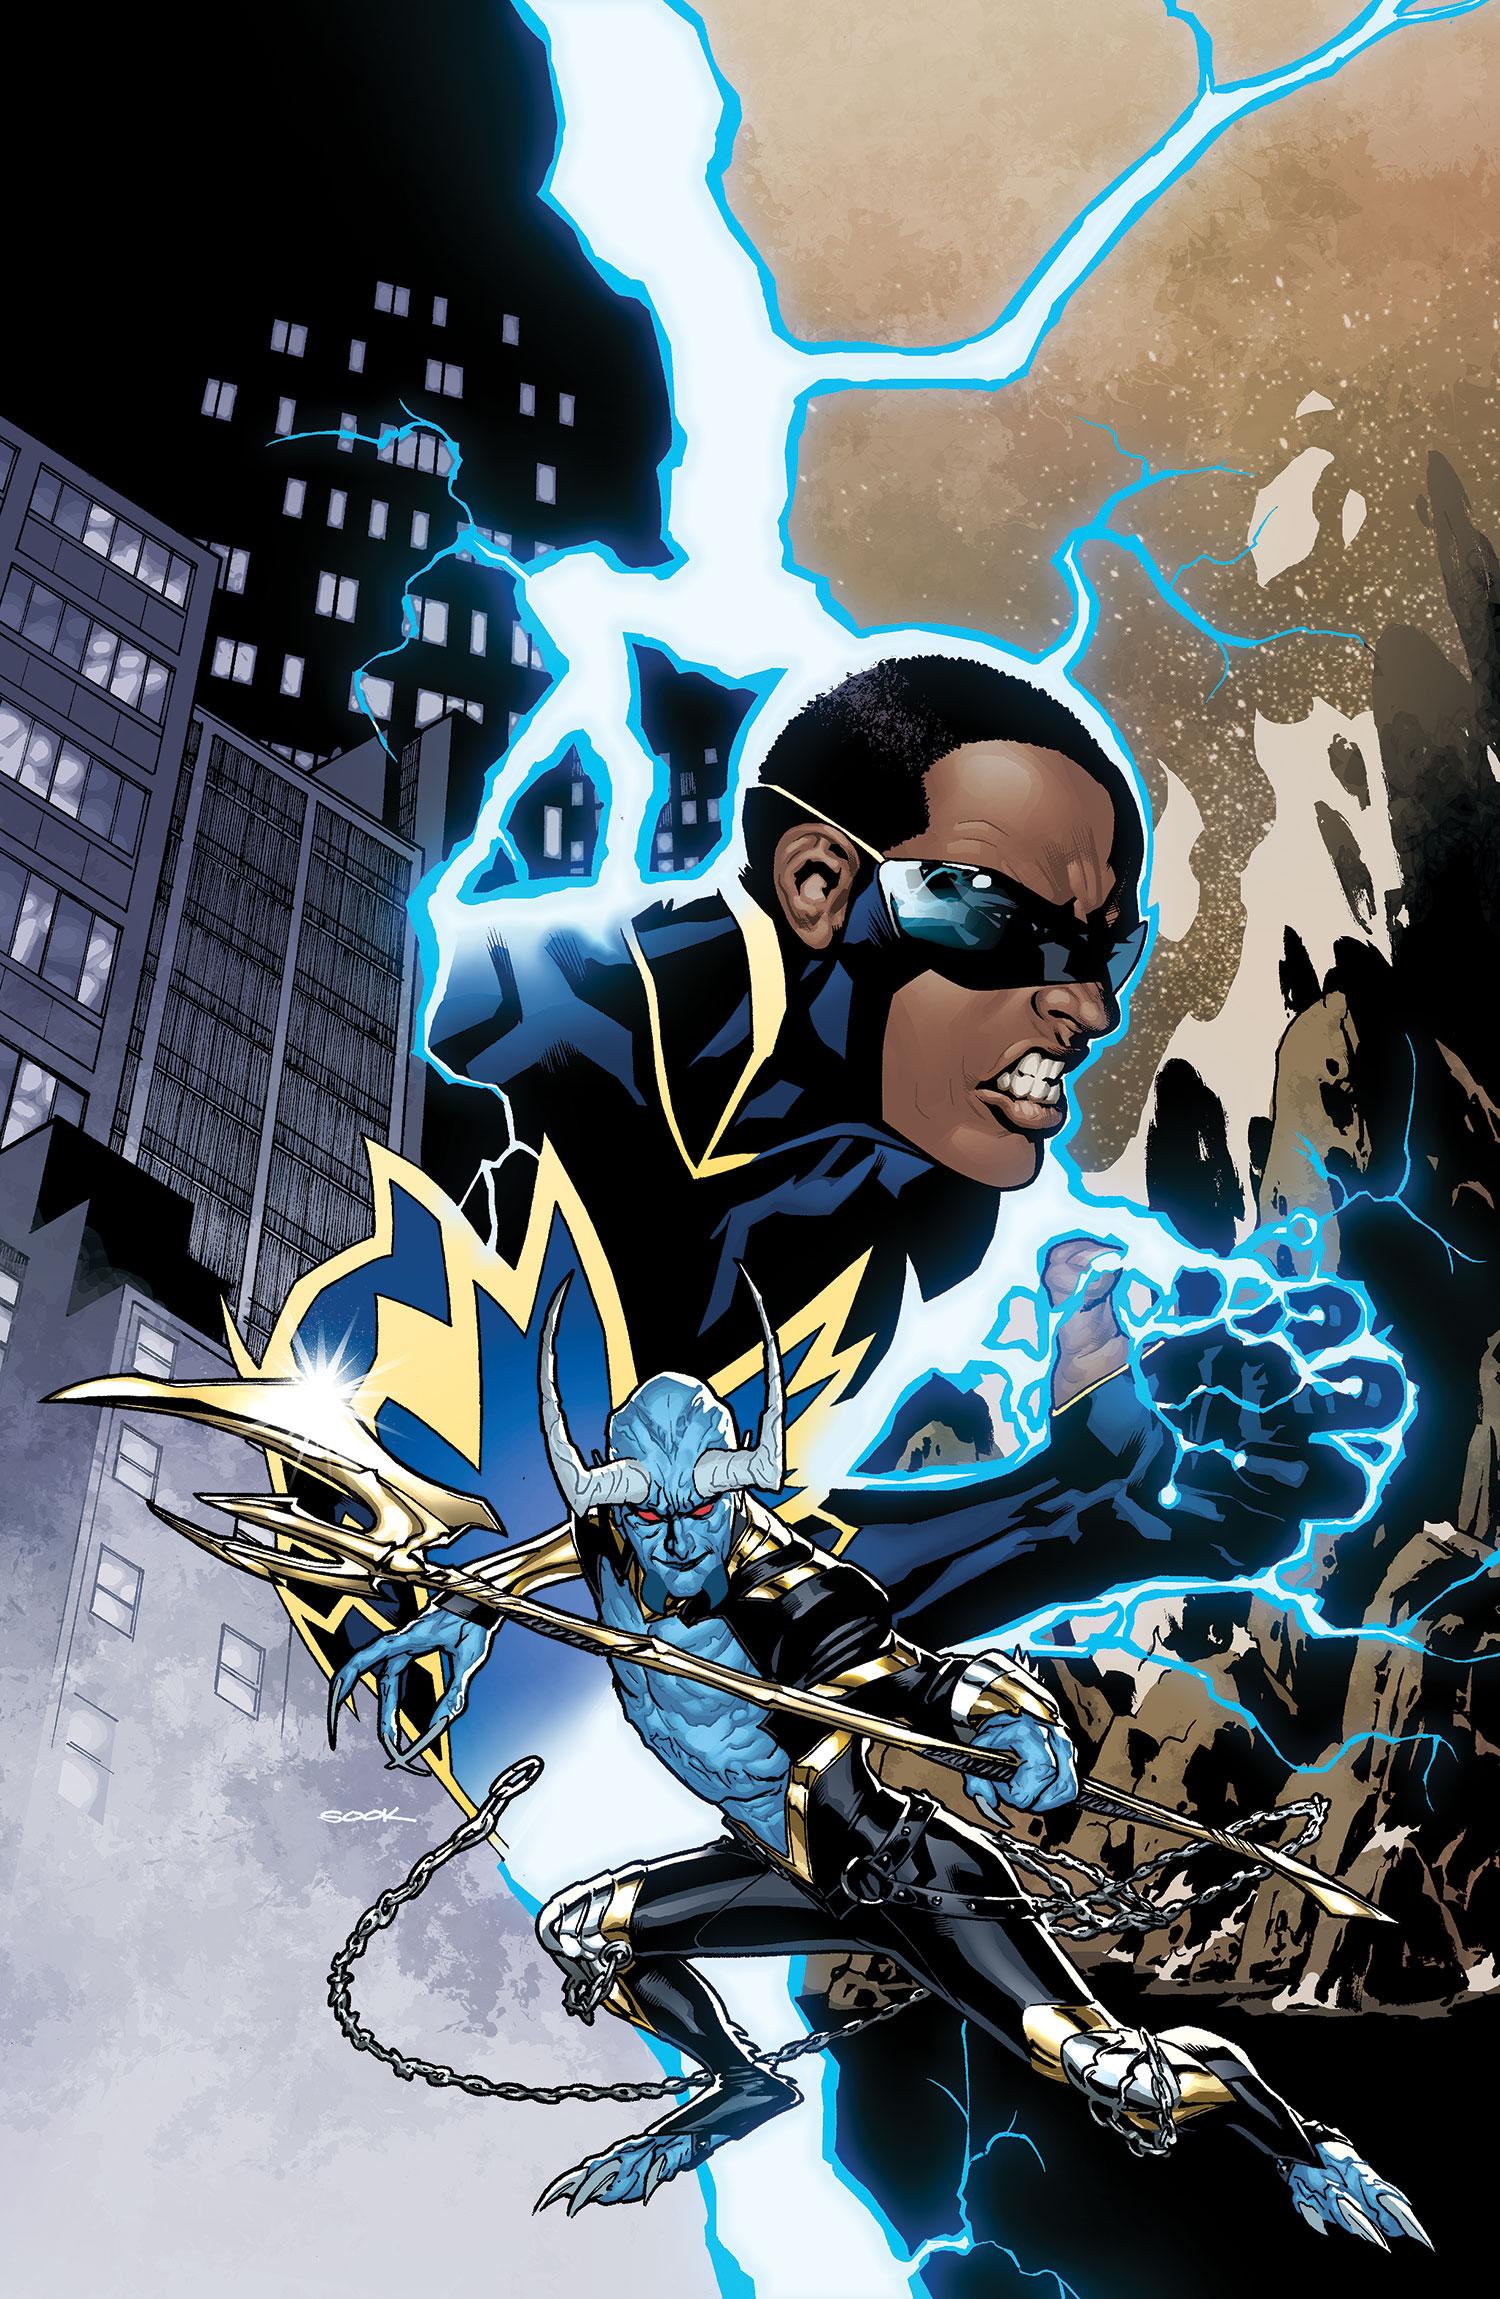 Amazing Black Lightning Pictures & Backgrounds